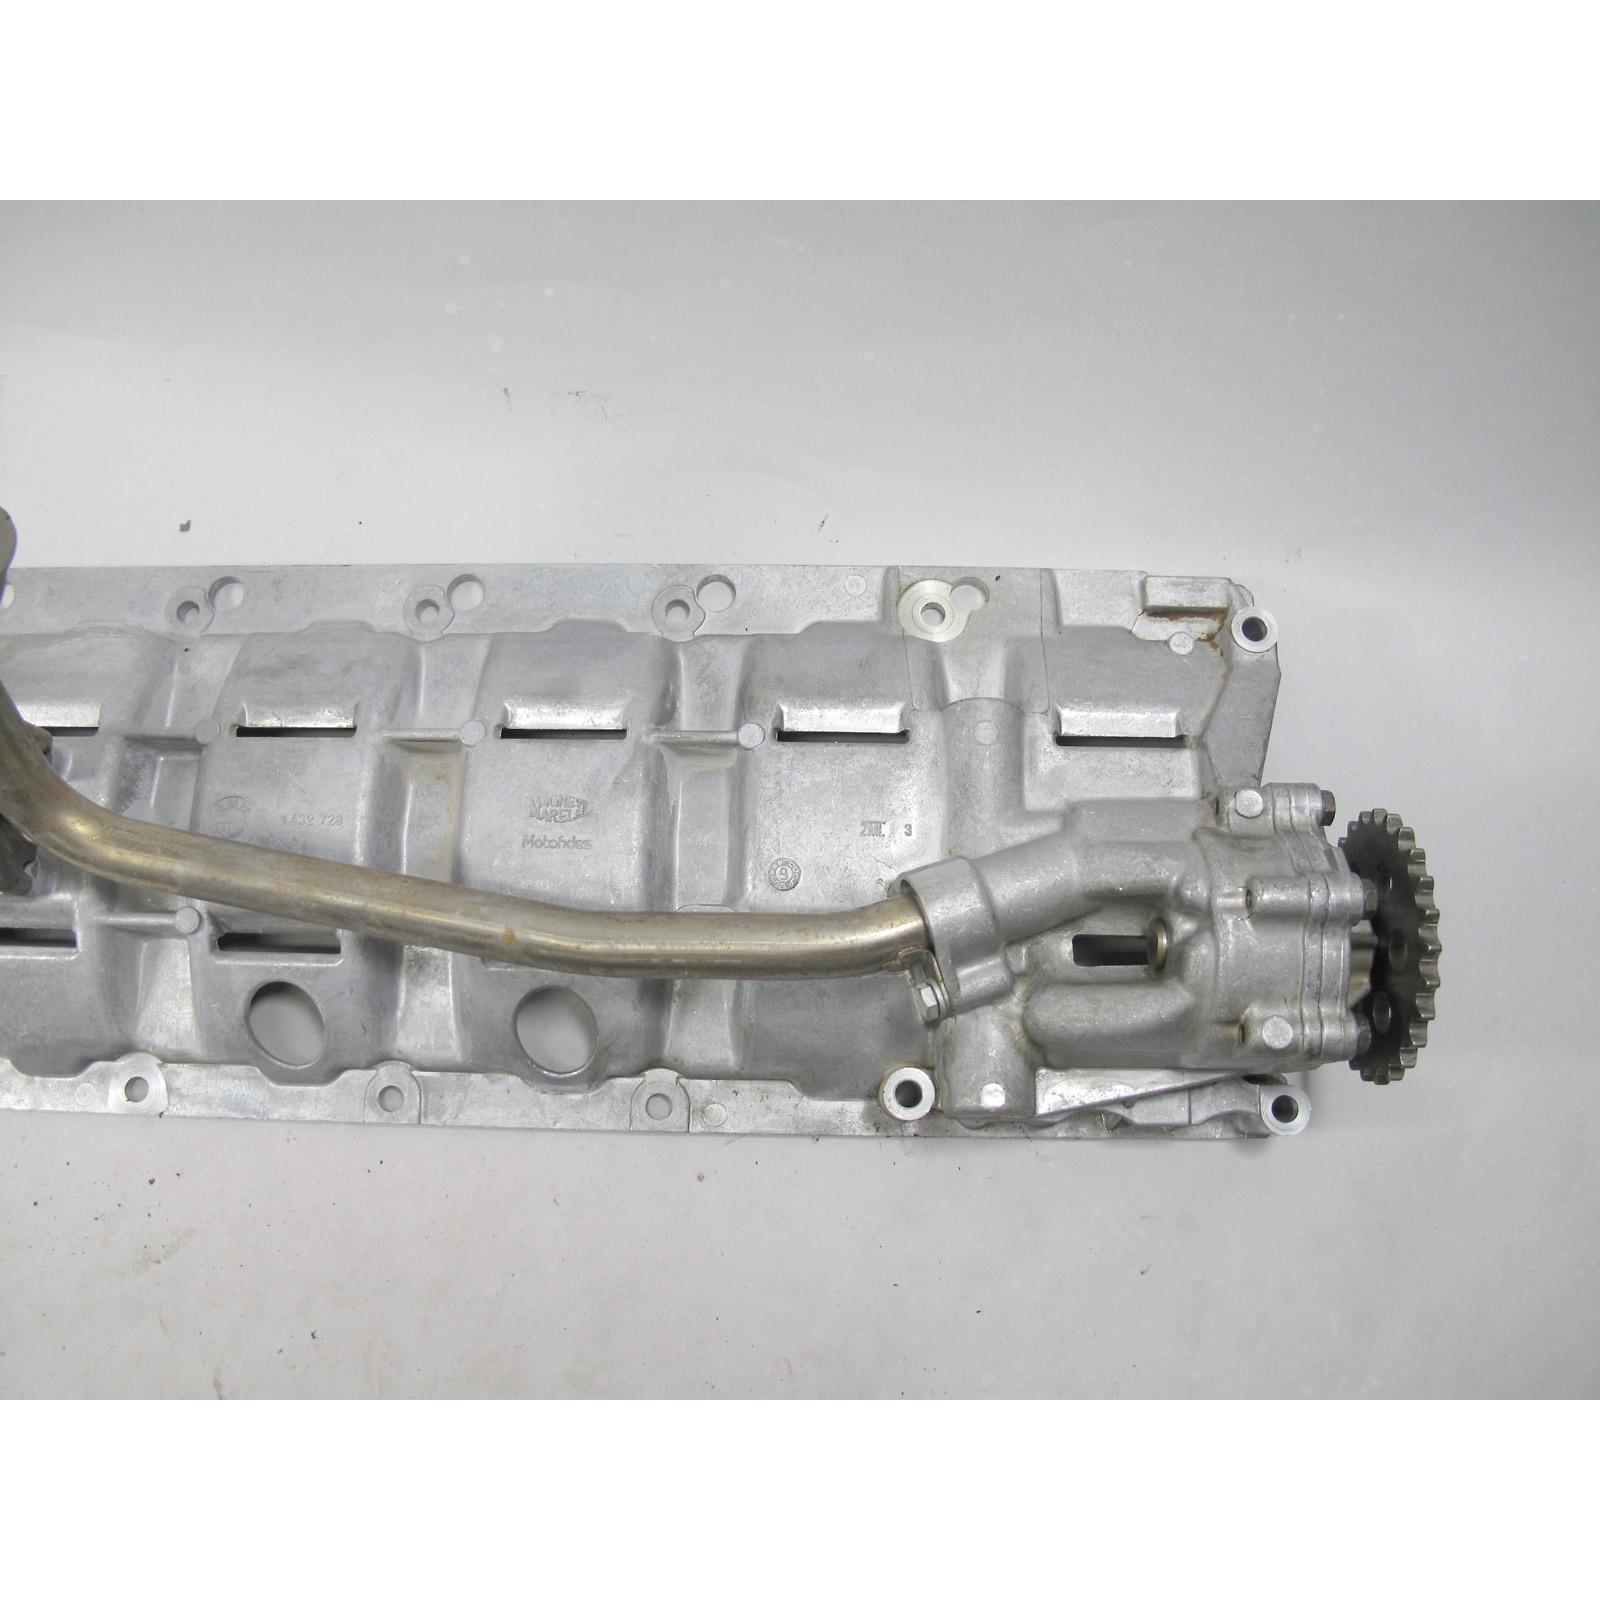 Bmw M52tu 2 5l 2 8l Engine Oil Pump Assembly E39 E46 Z3